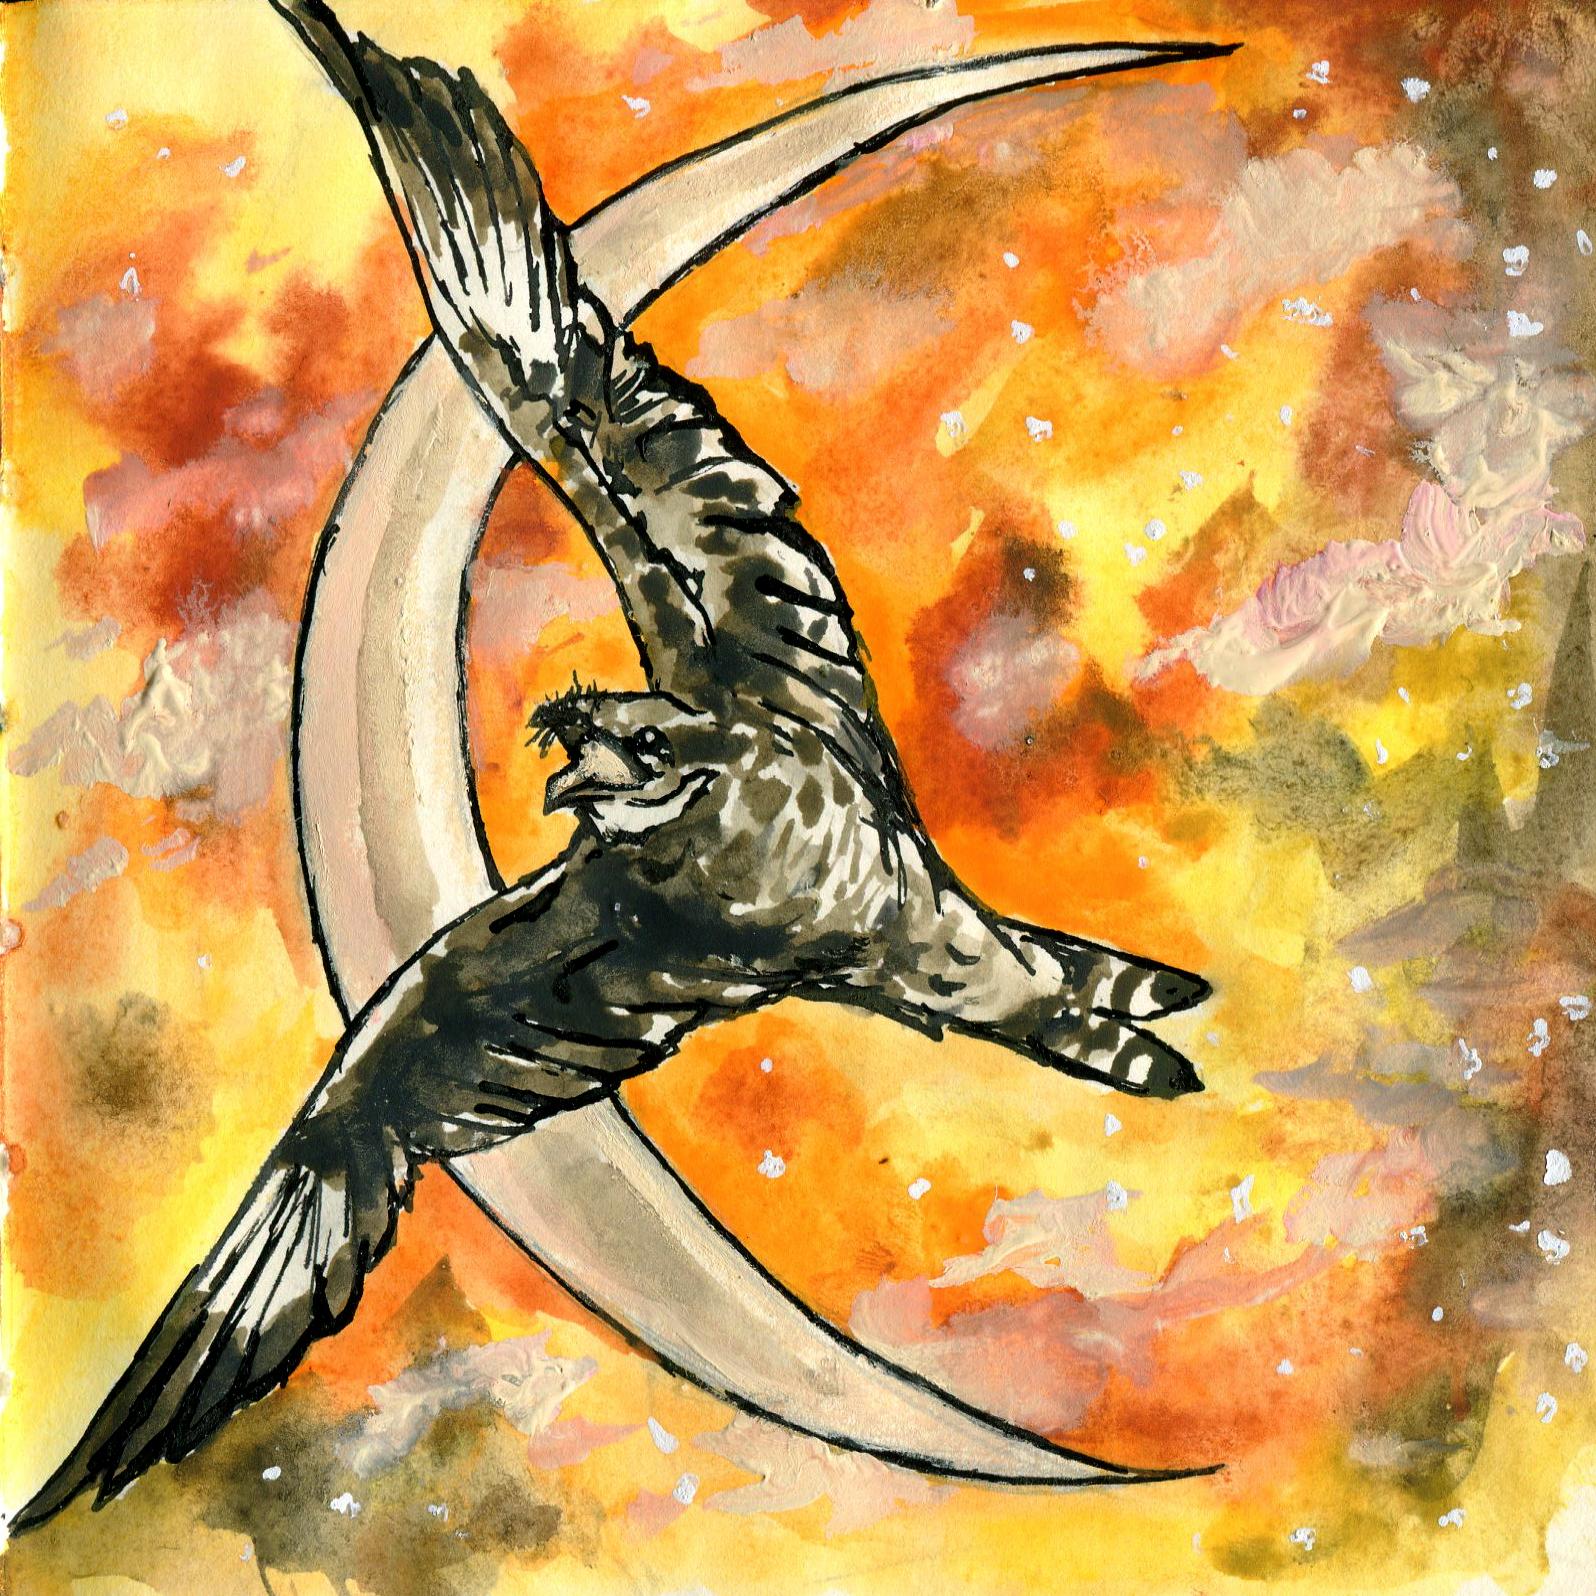 209. Common Nighthawk